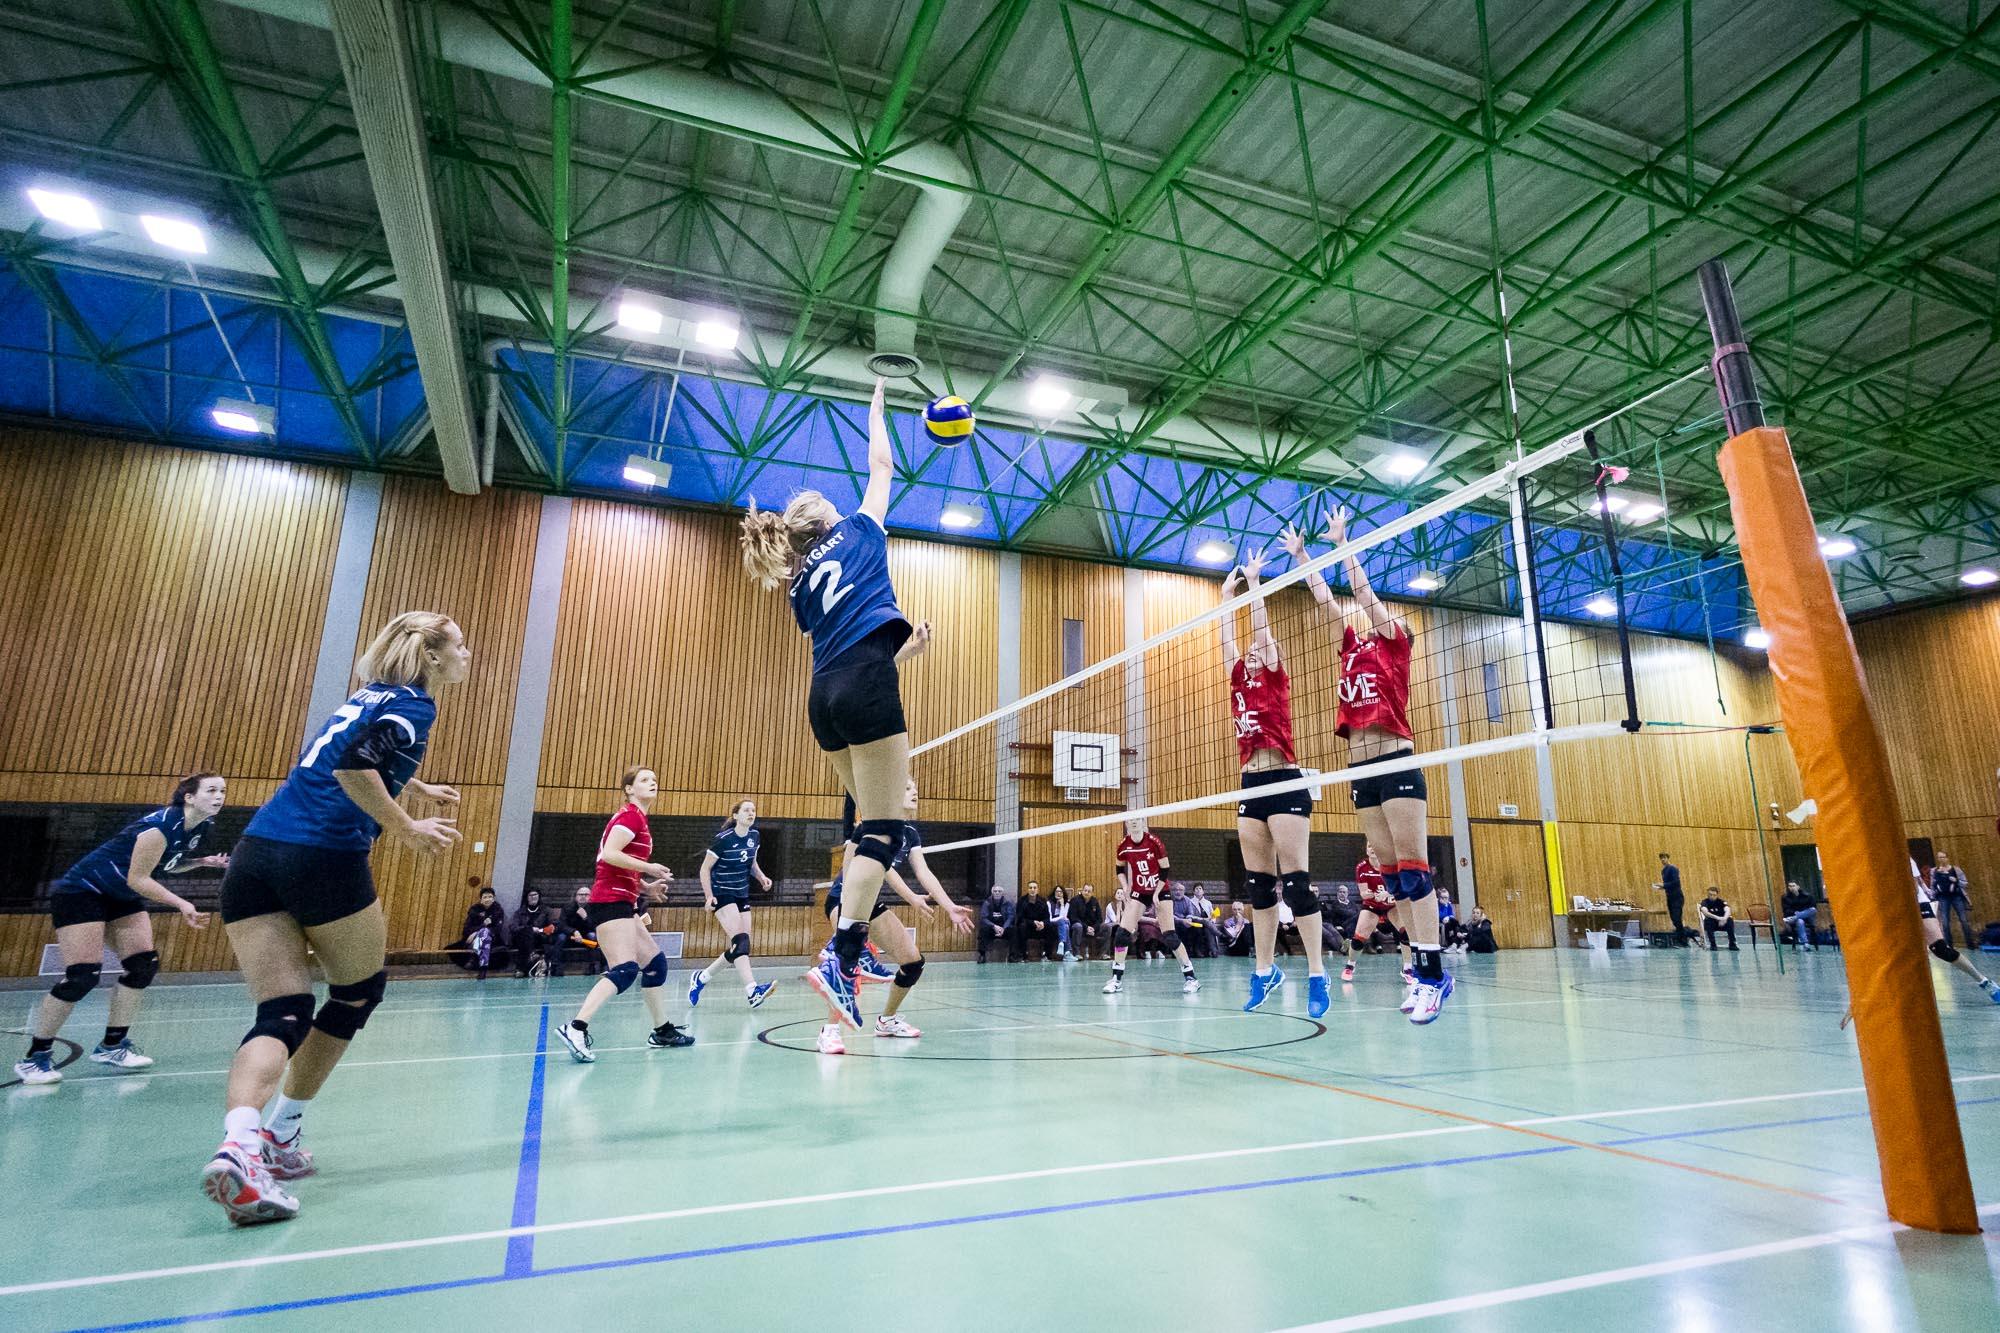 Foto: Nils Wüchner www.nils-wuechner.de